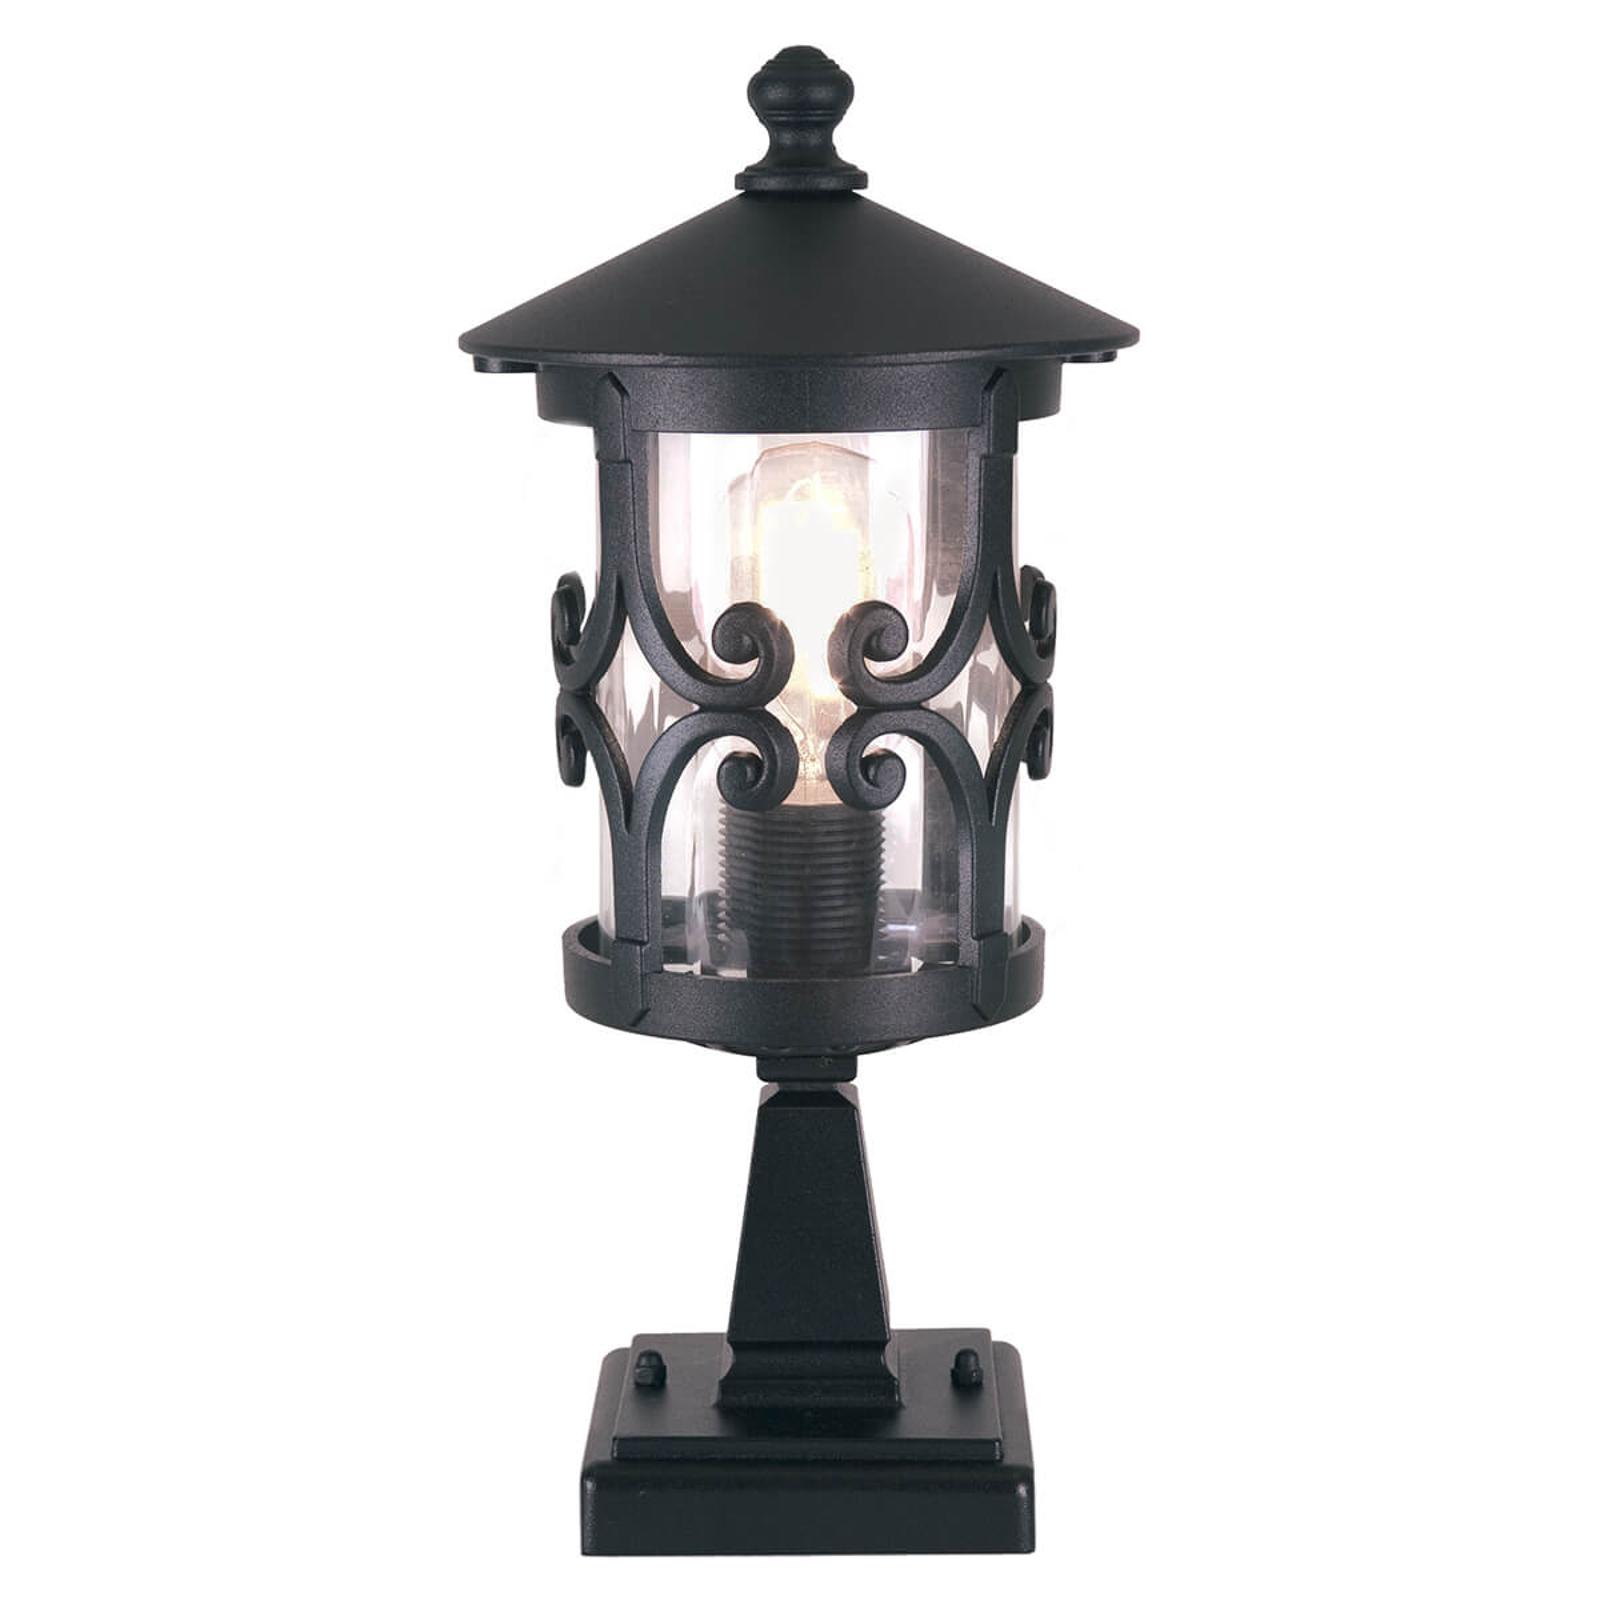 Dekorativ sockellampa Hereford